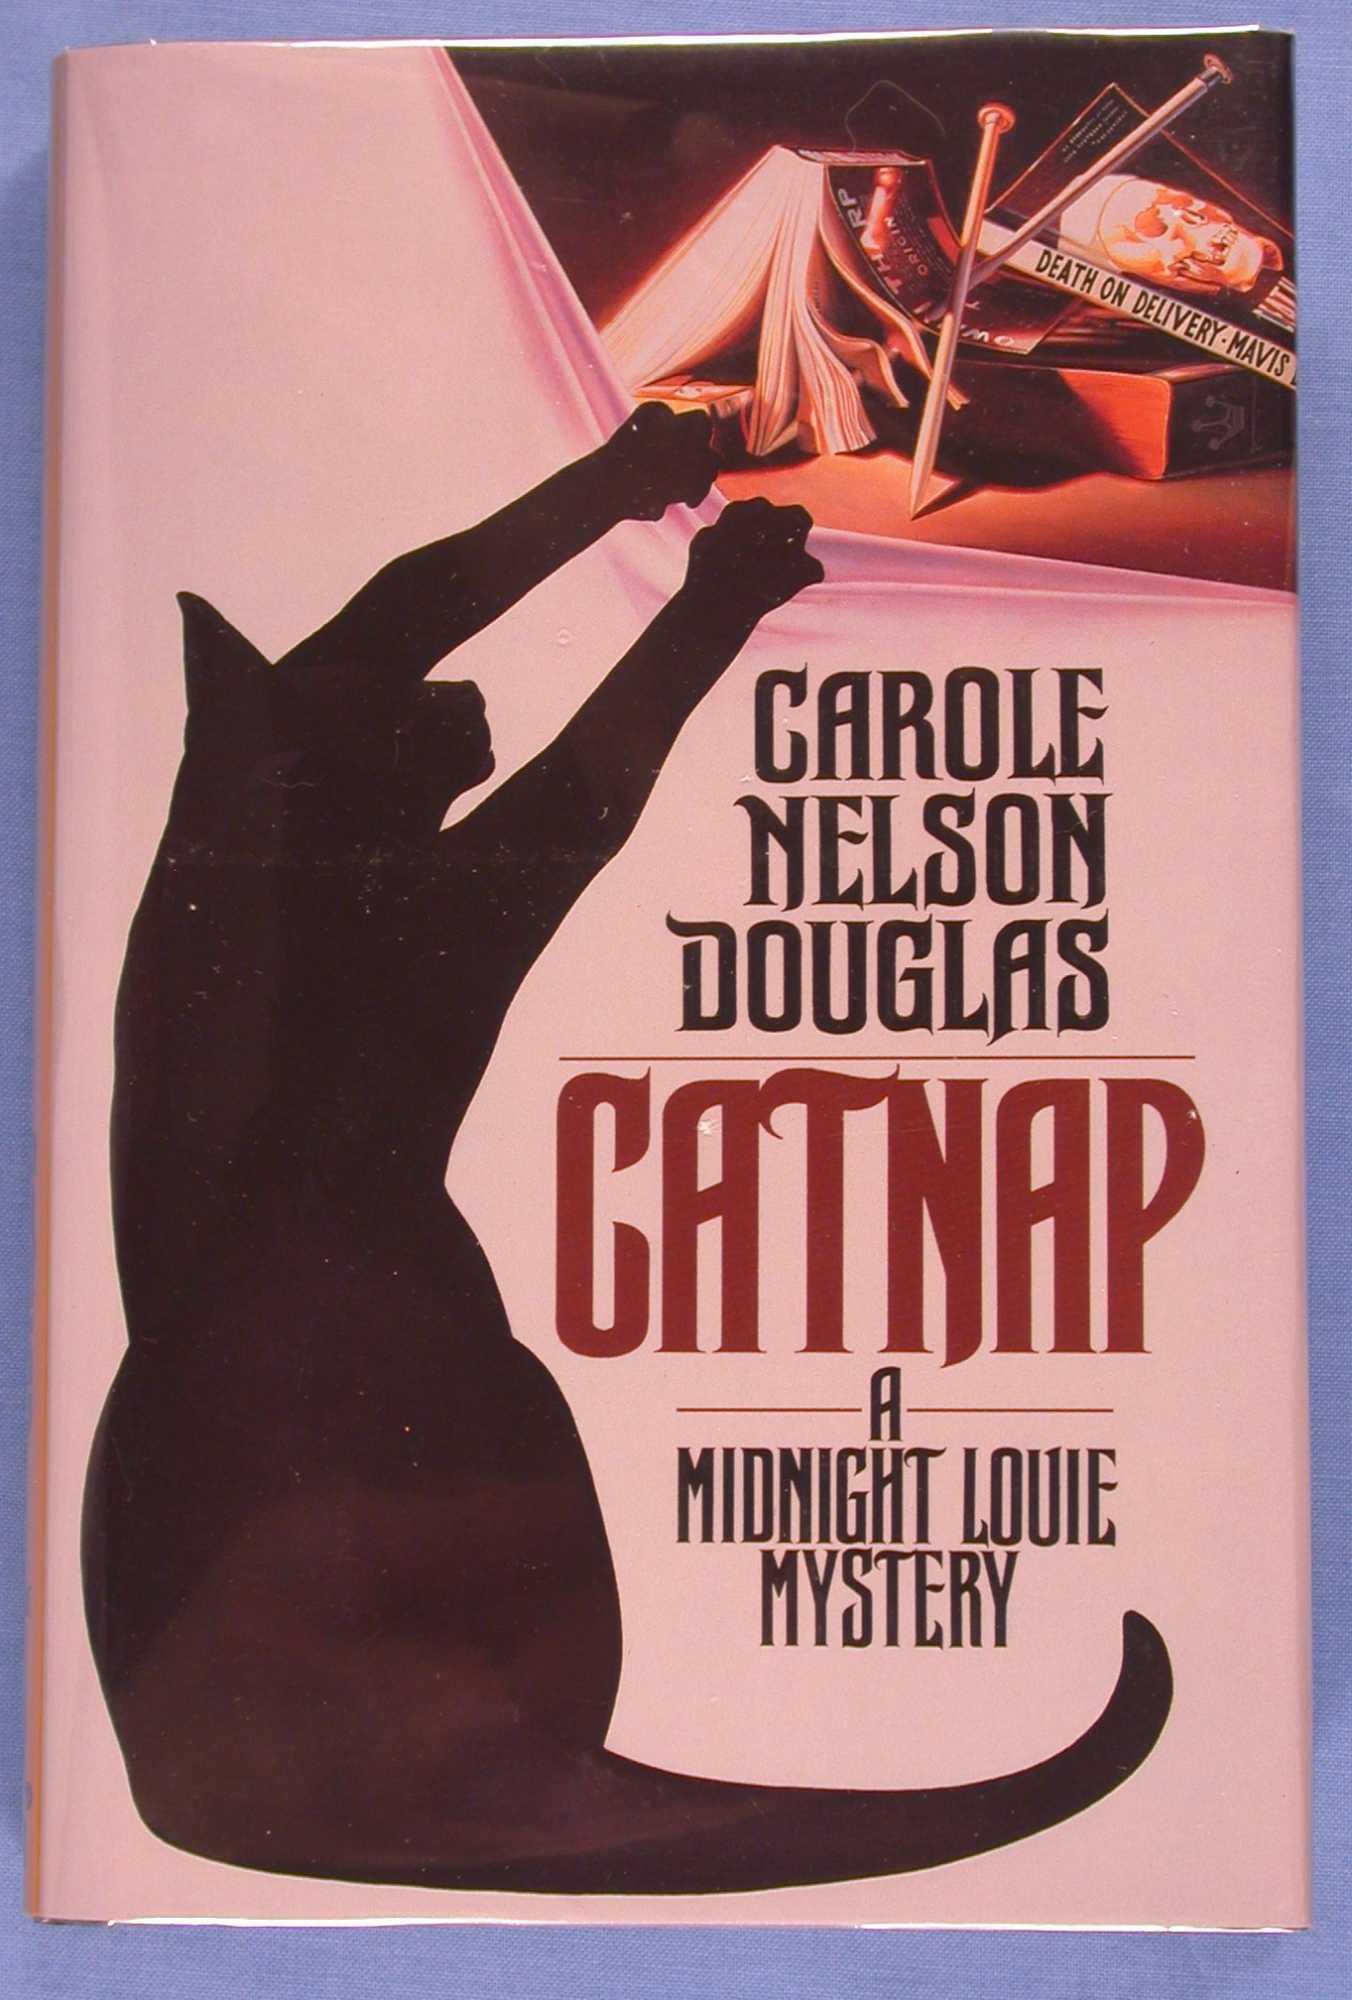 Catnap (Midnight Louie Mystery #1), Douglas, Carole Nelson